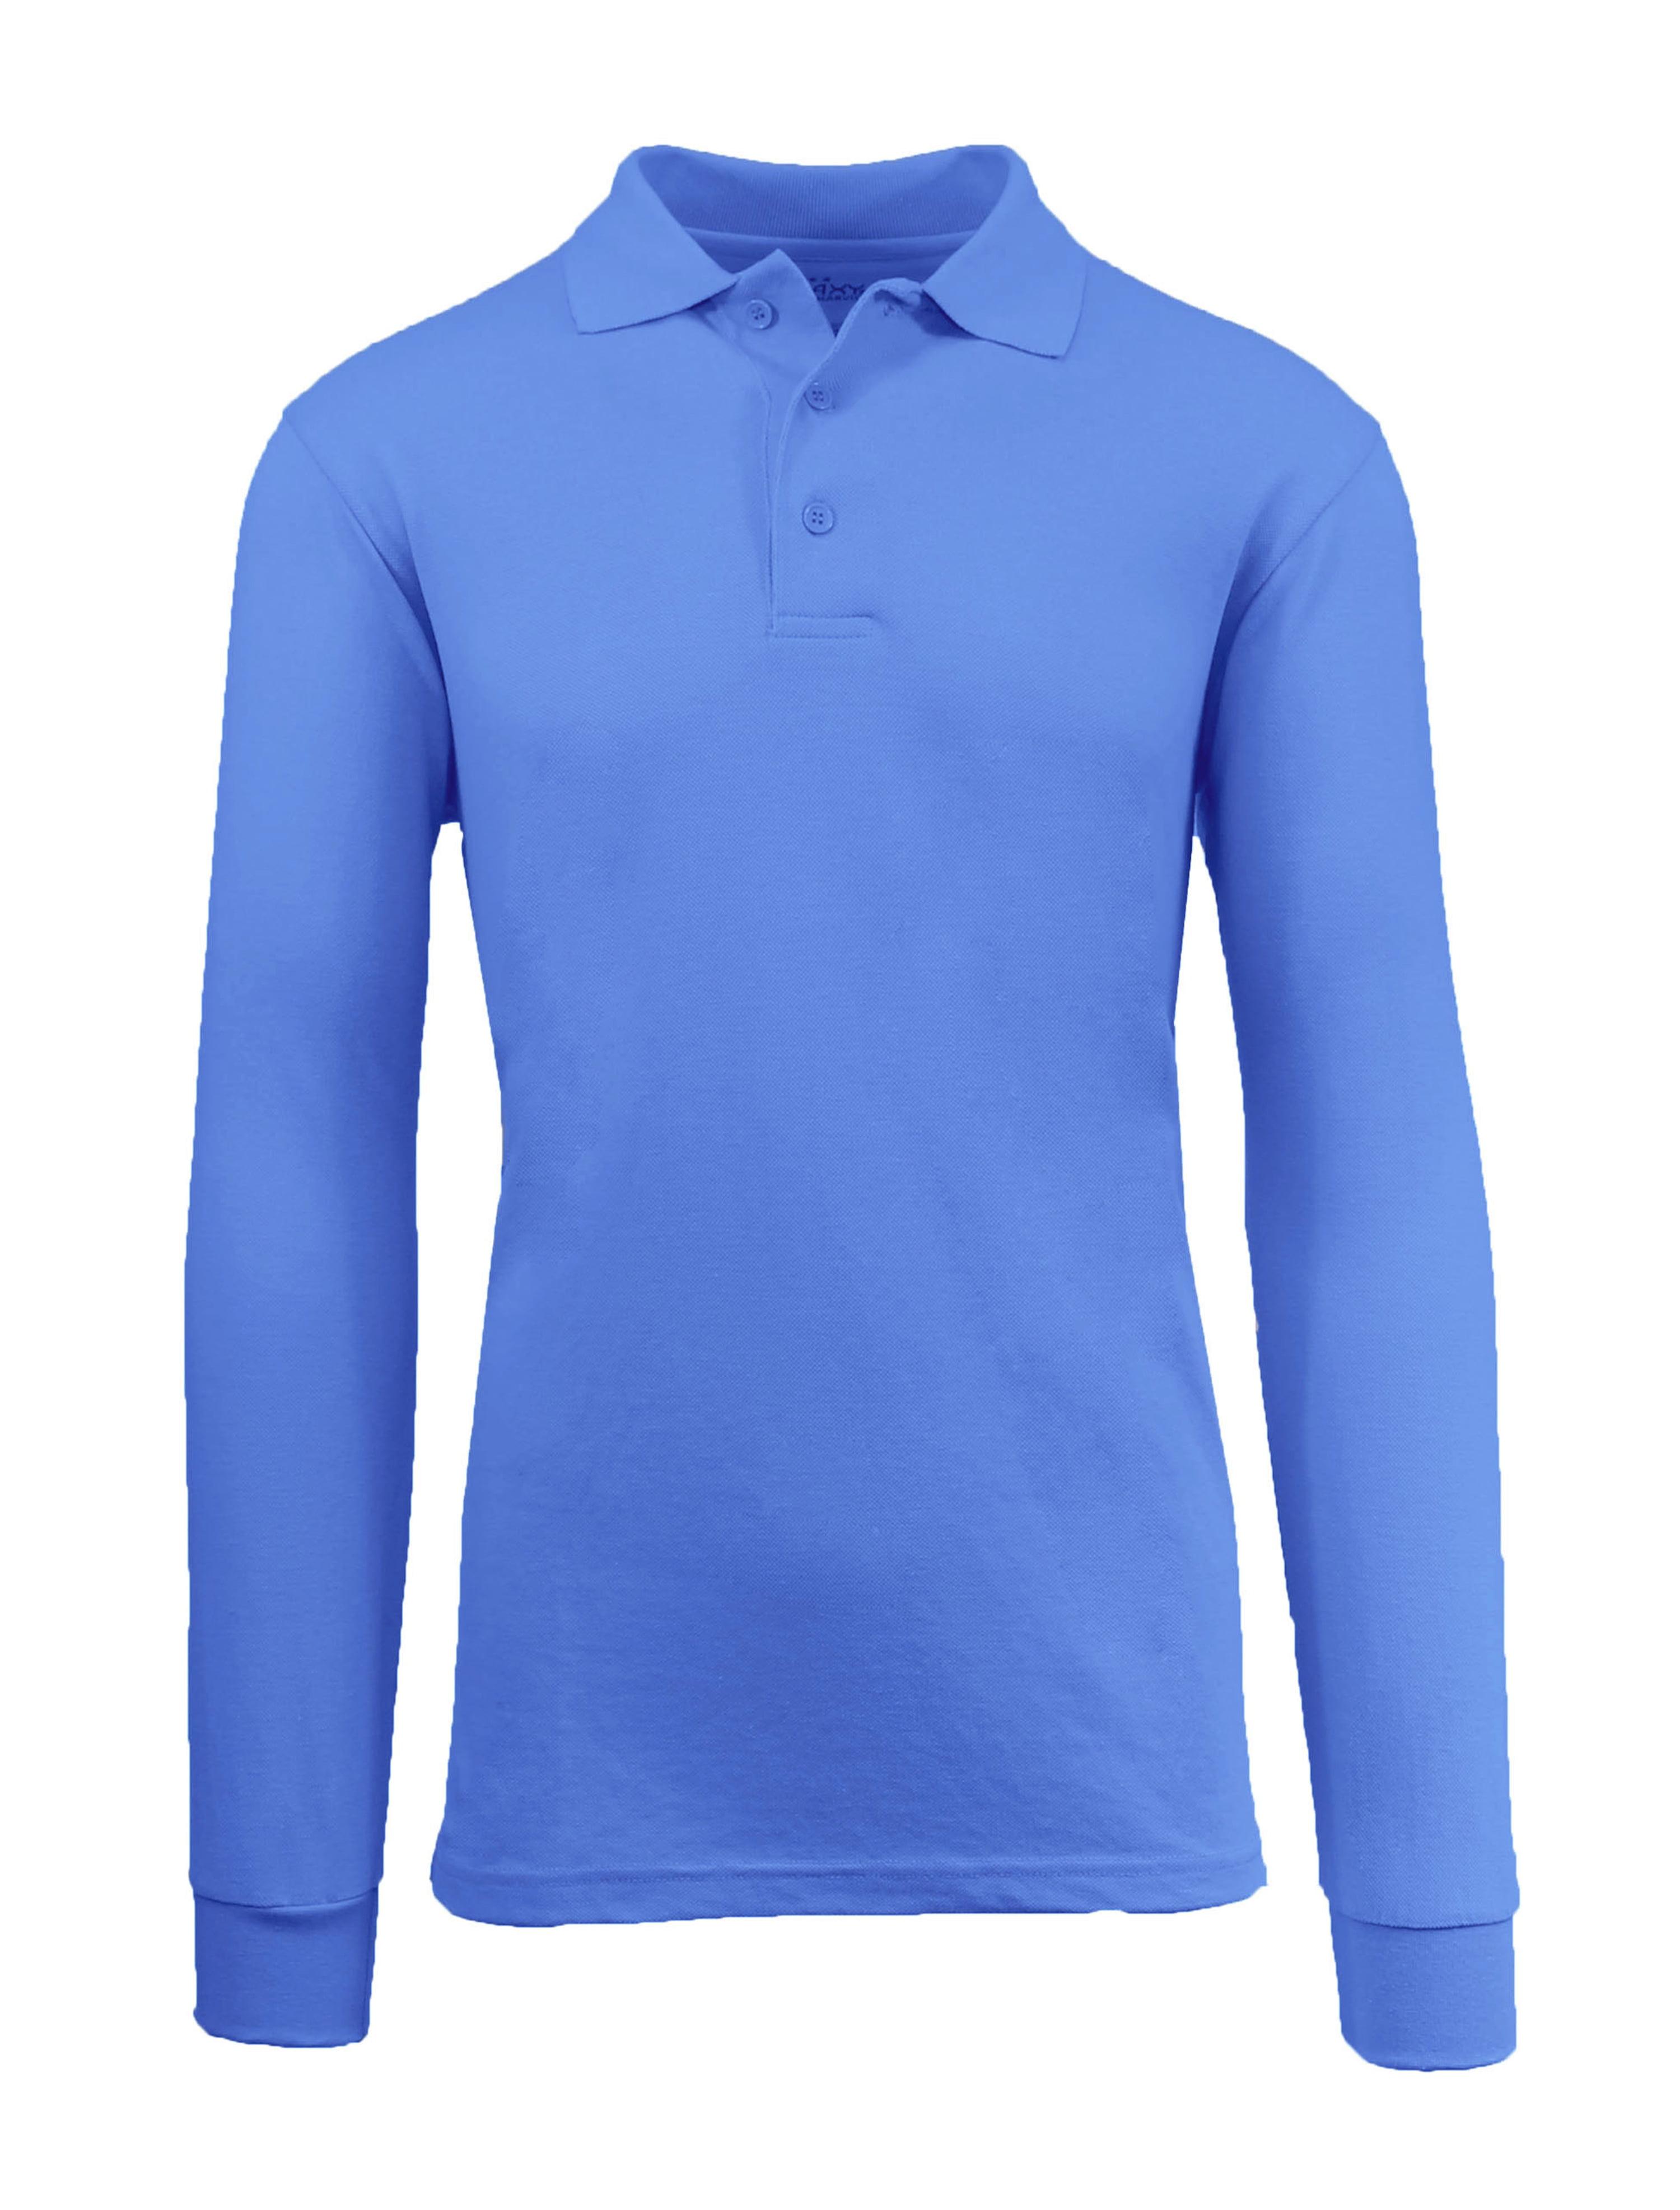 Men's Long Sleeve Polo Shirts